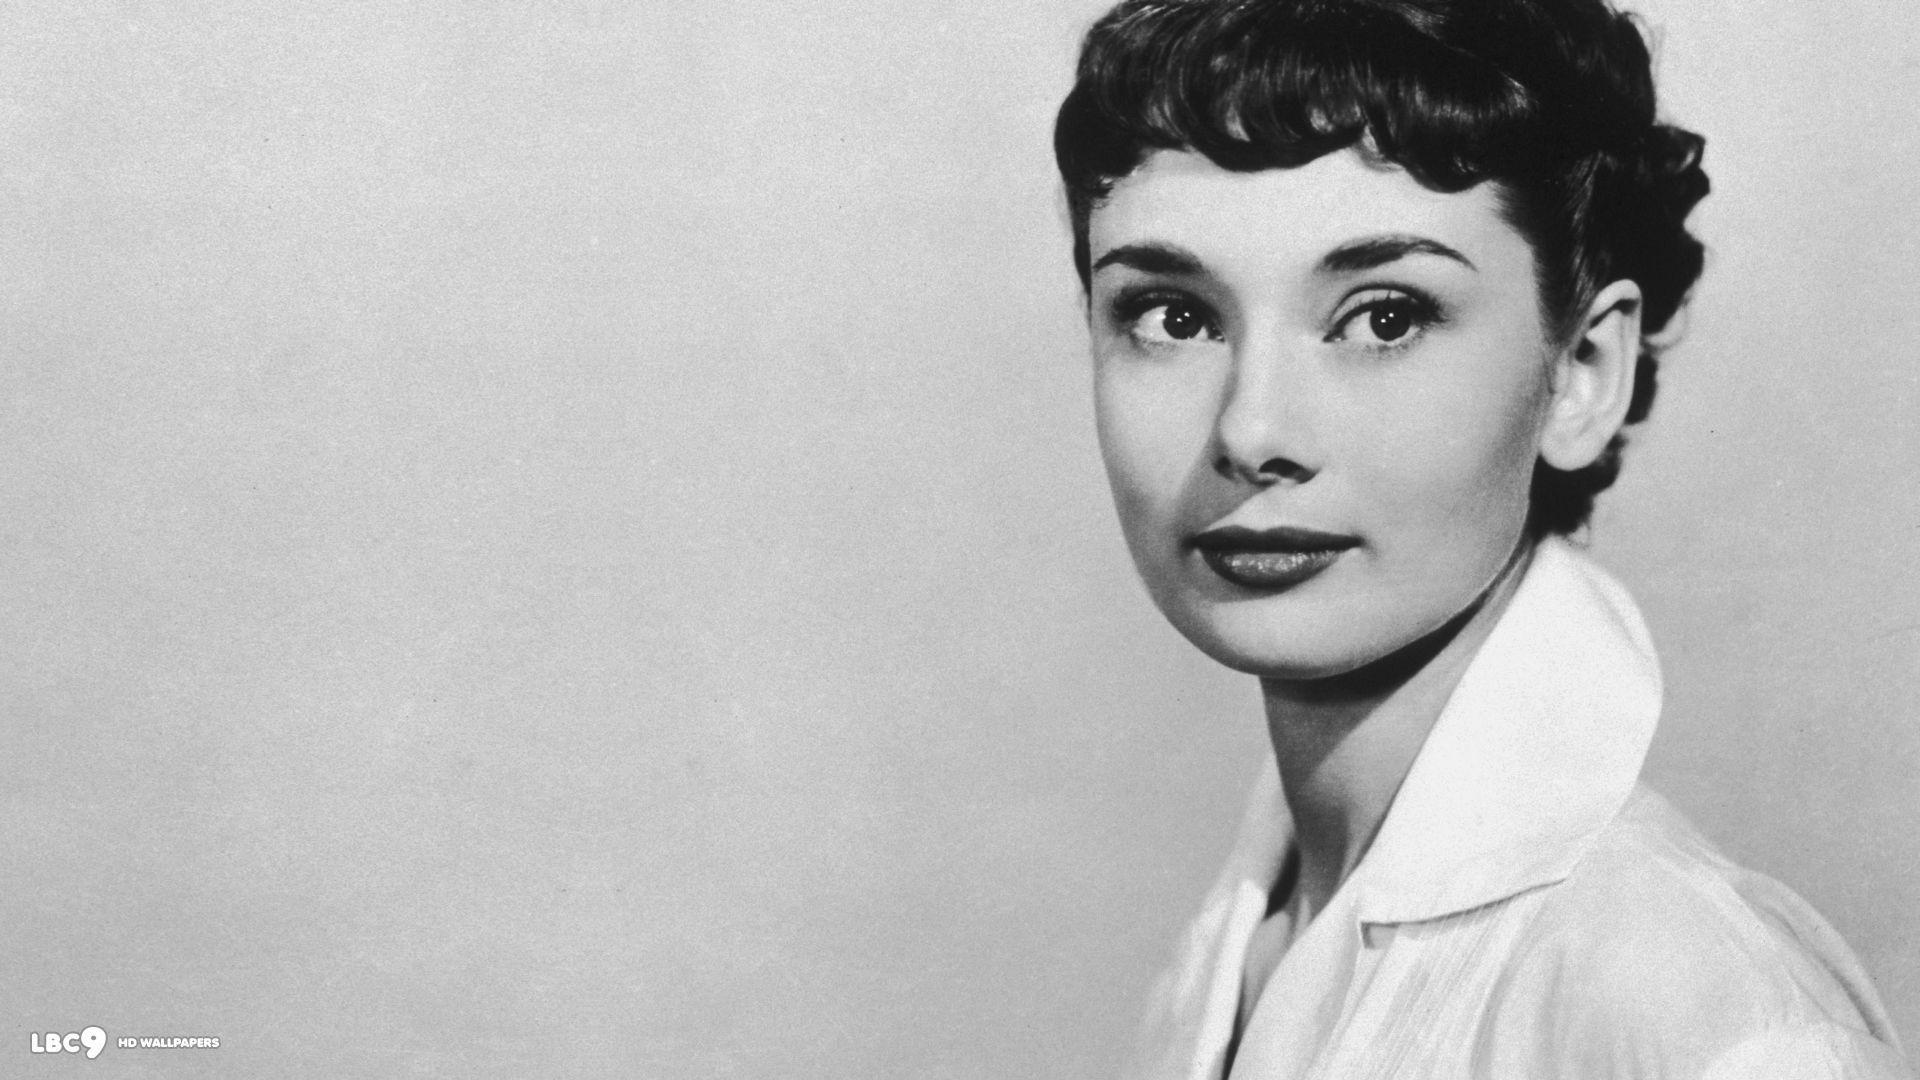 Audrey Hepburn Wallpapers Images Photos Pictures Backgrounds 1920x1080